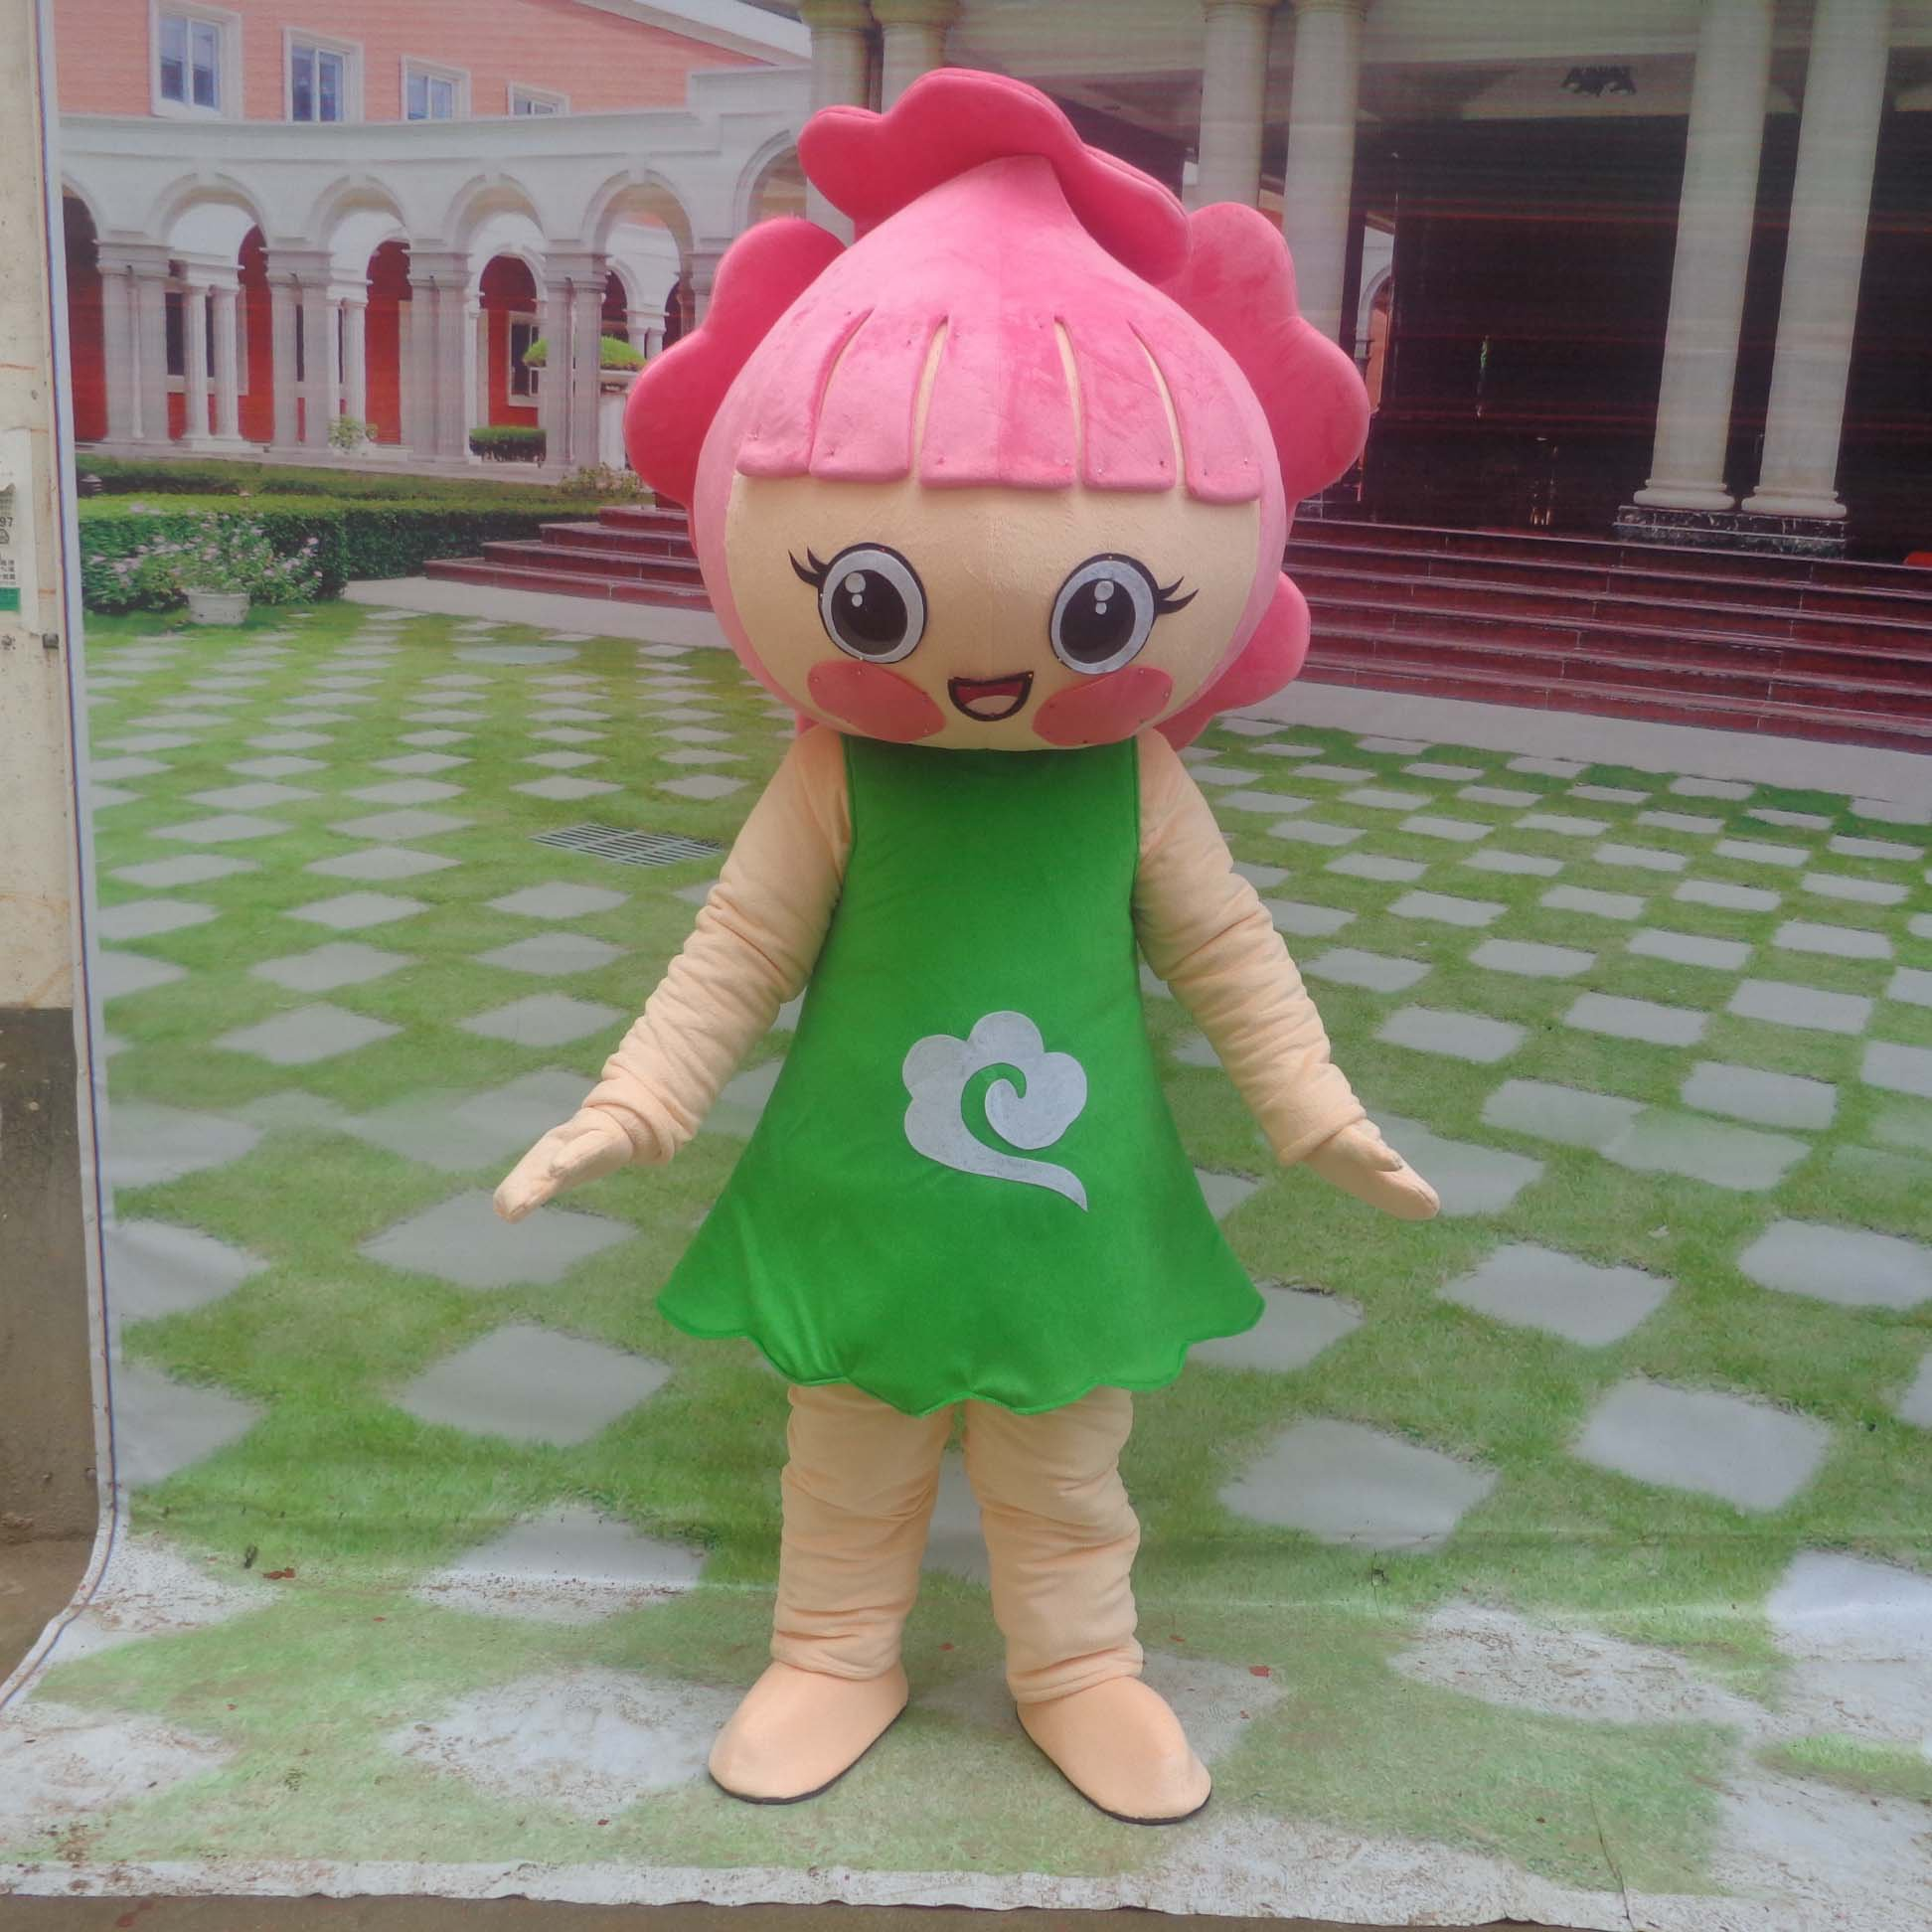 Cartoon Doll Clothing Cartoon Walking Doll Clothing Cartoon Dolls Dolls Props Fruit Plant Mascot Costume